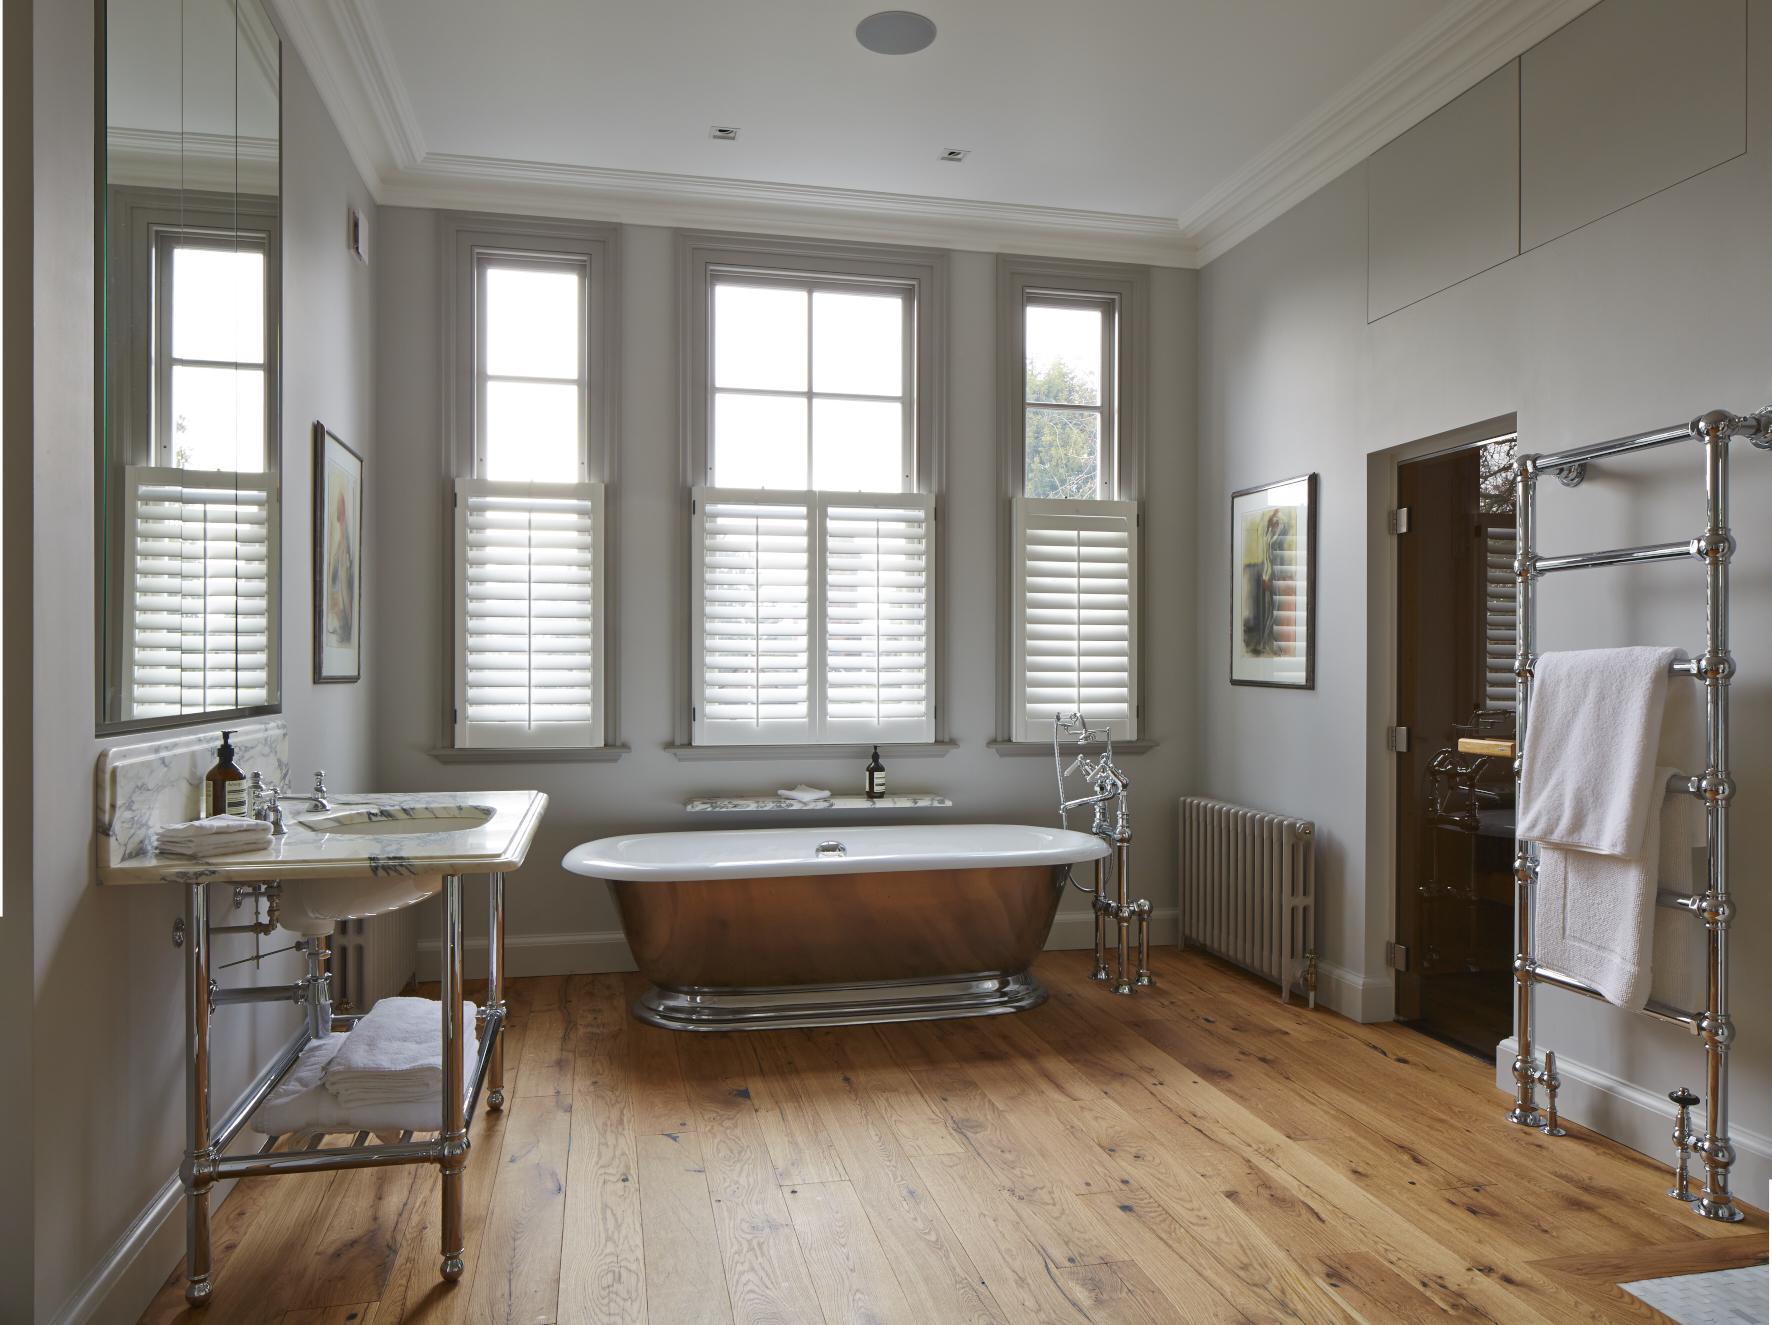 Hampstead bathroom interior